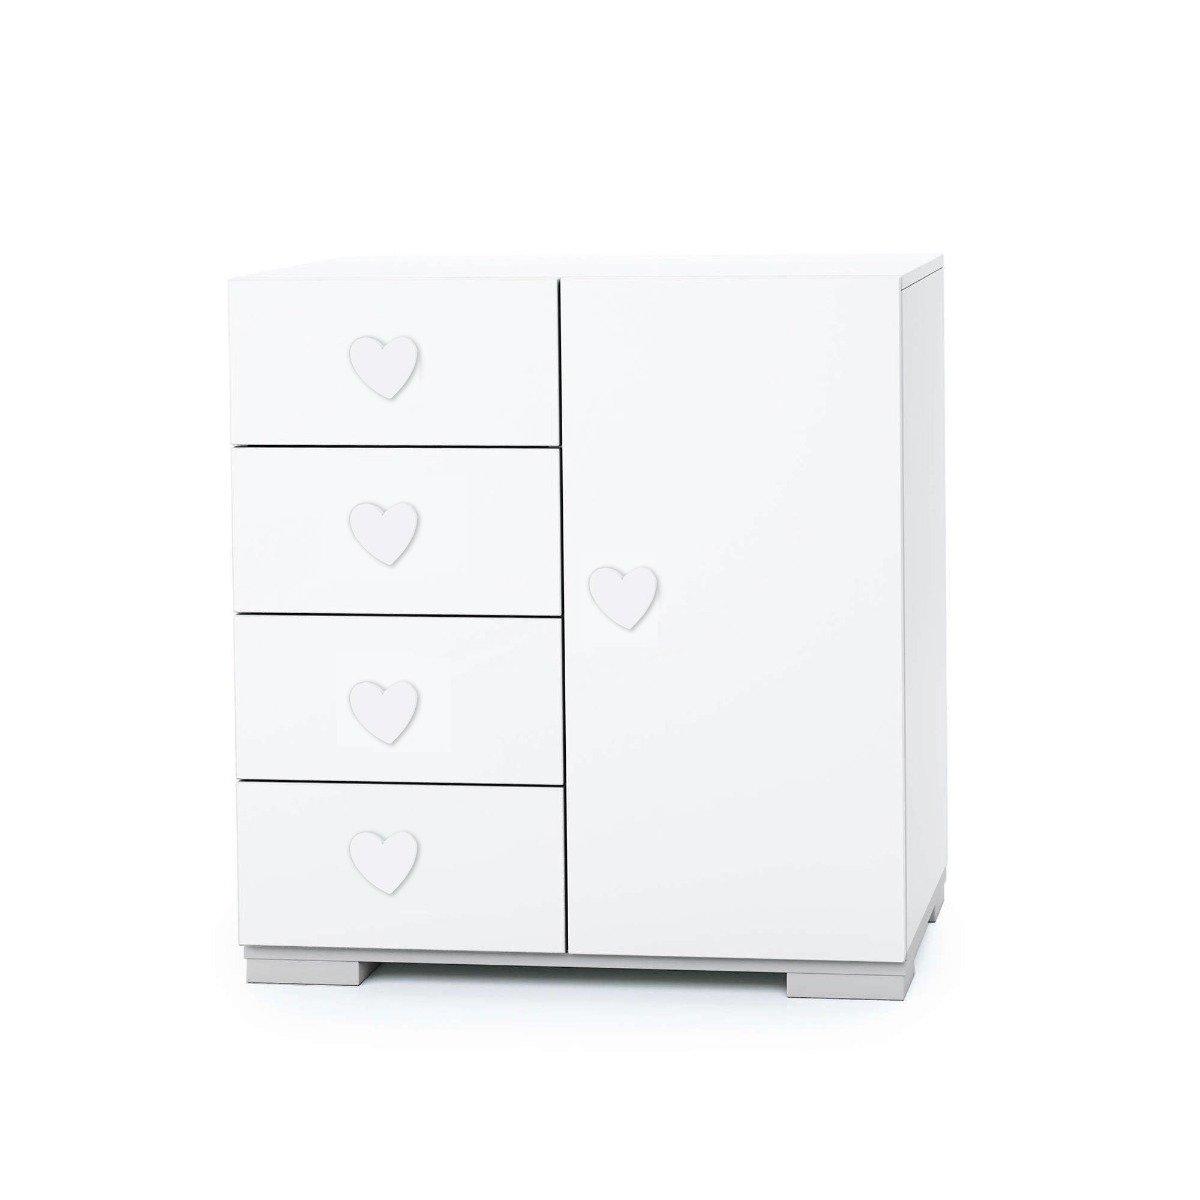 Comoda Mini Home Concept, Alb, Inimoara, 4 sertare + usa imagine